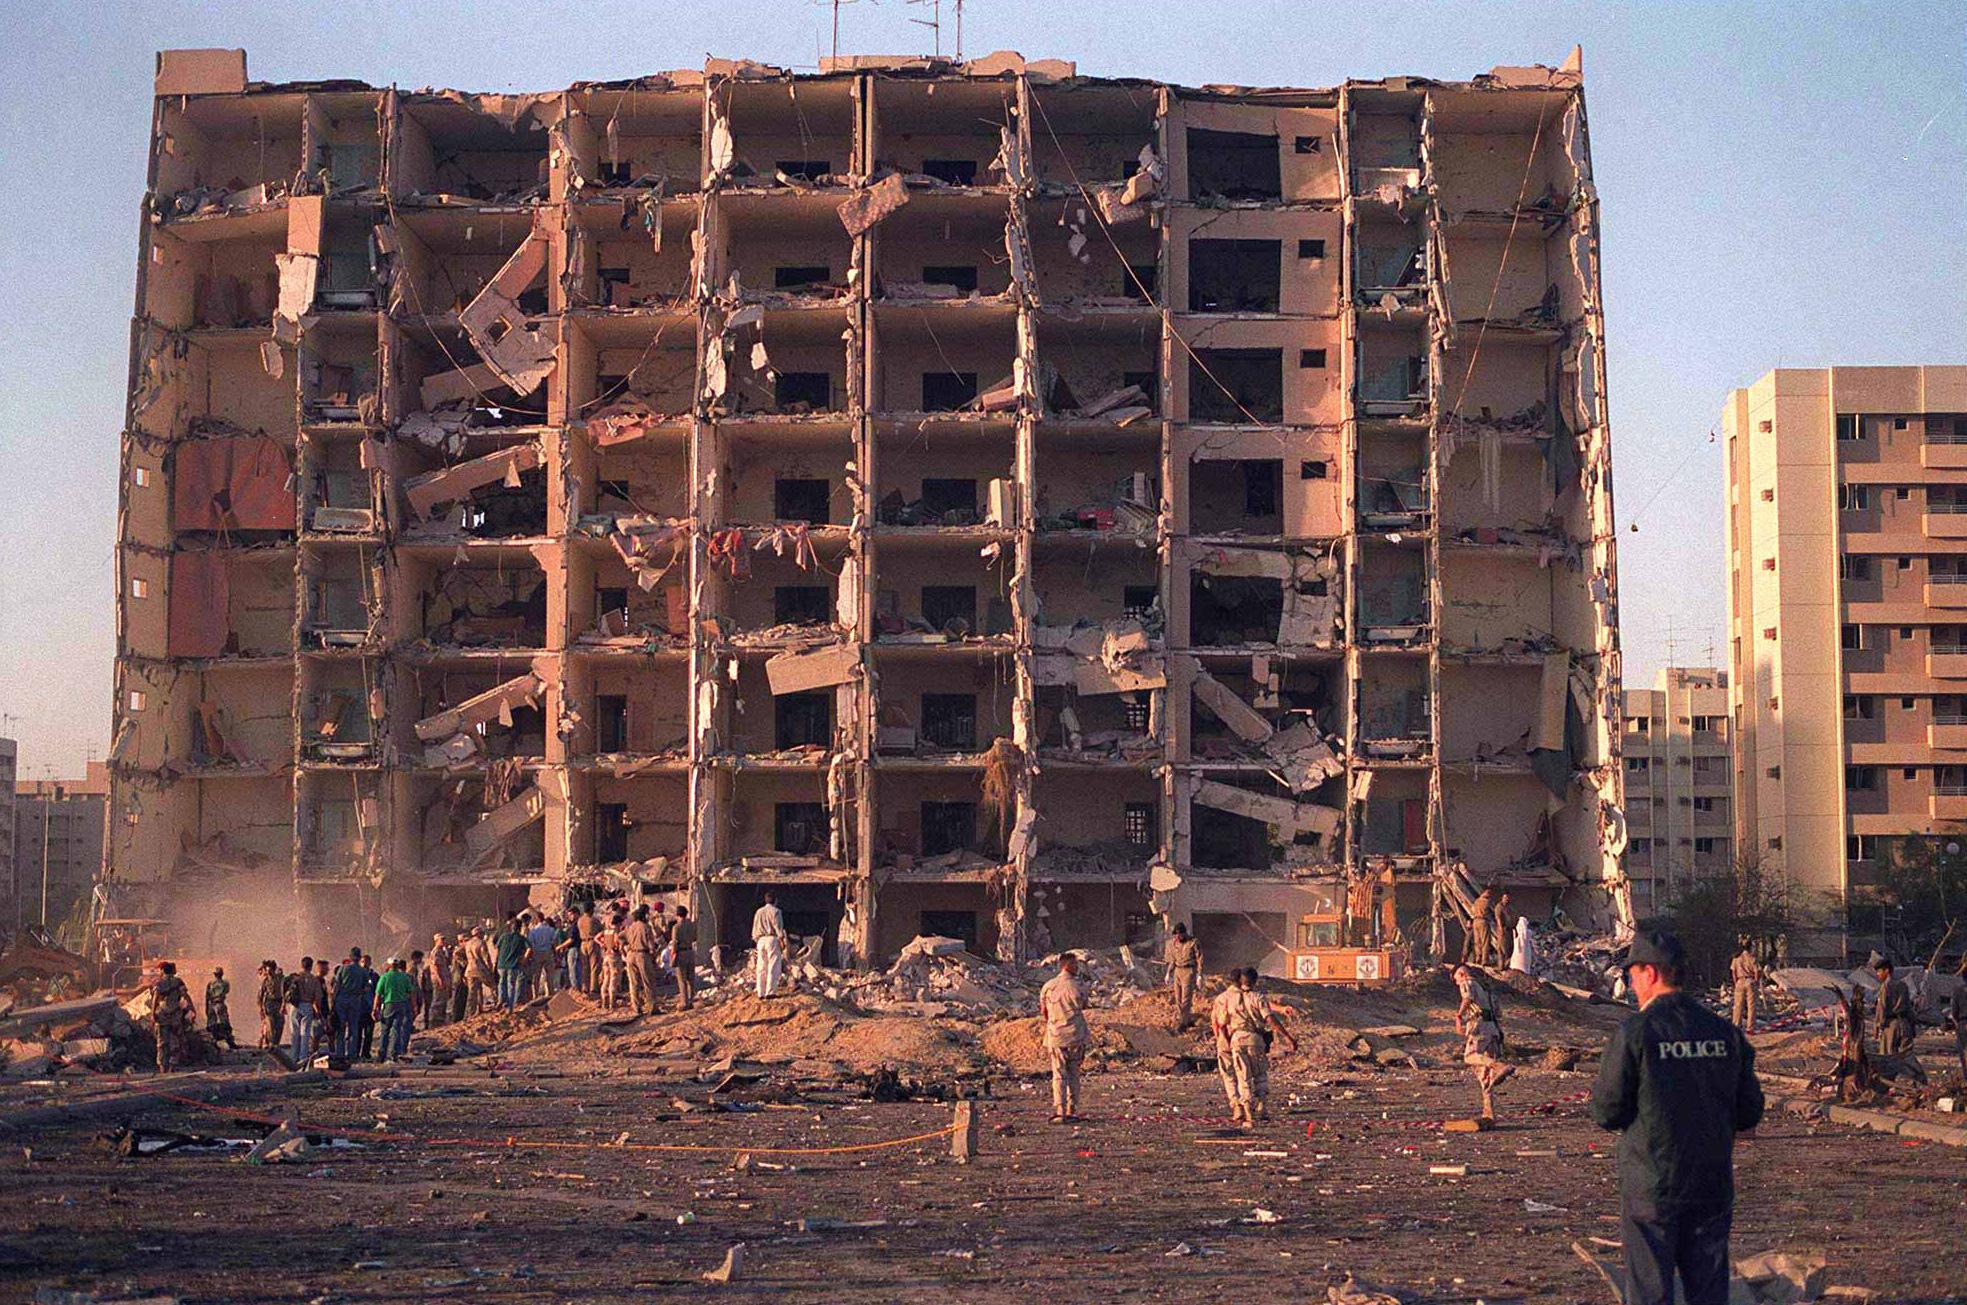 Khobar Towers bombing - Wikipedia